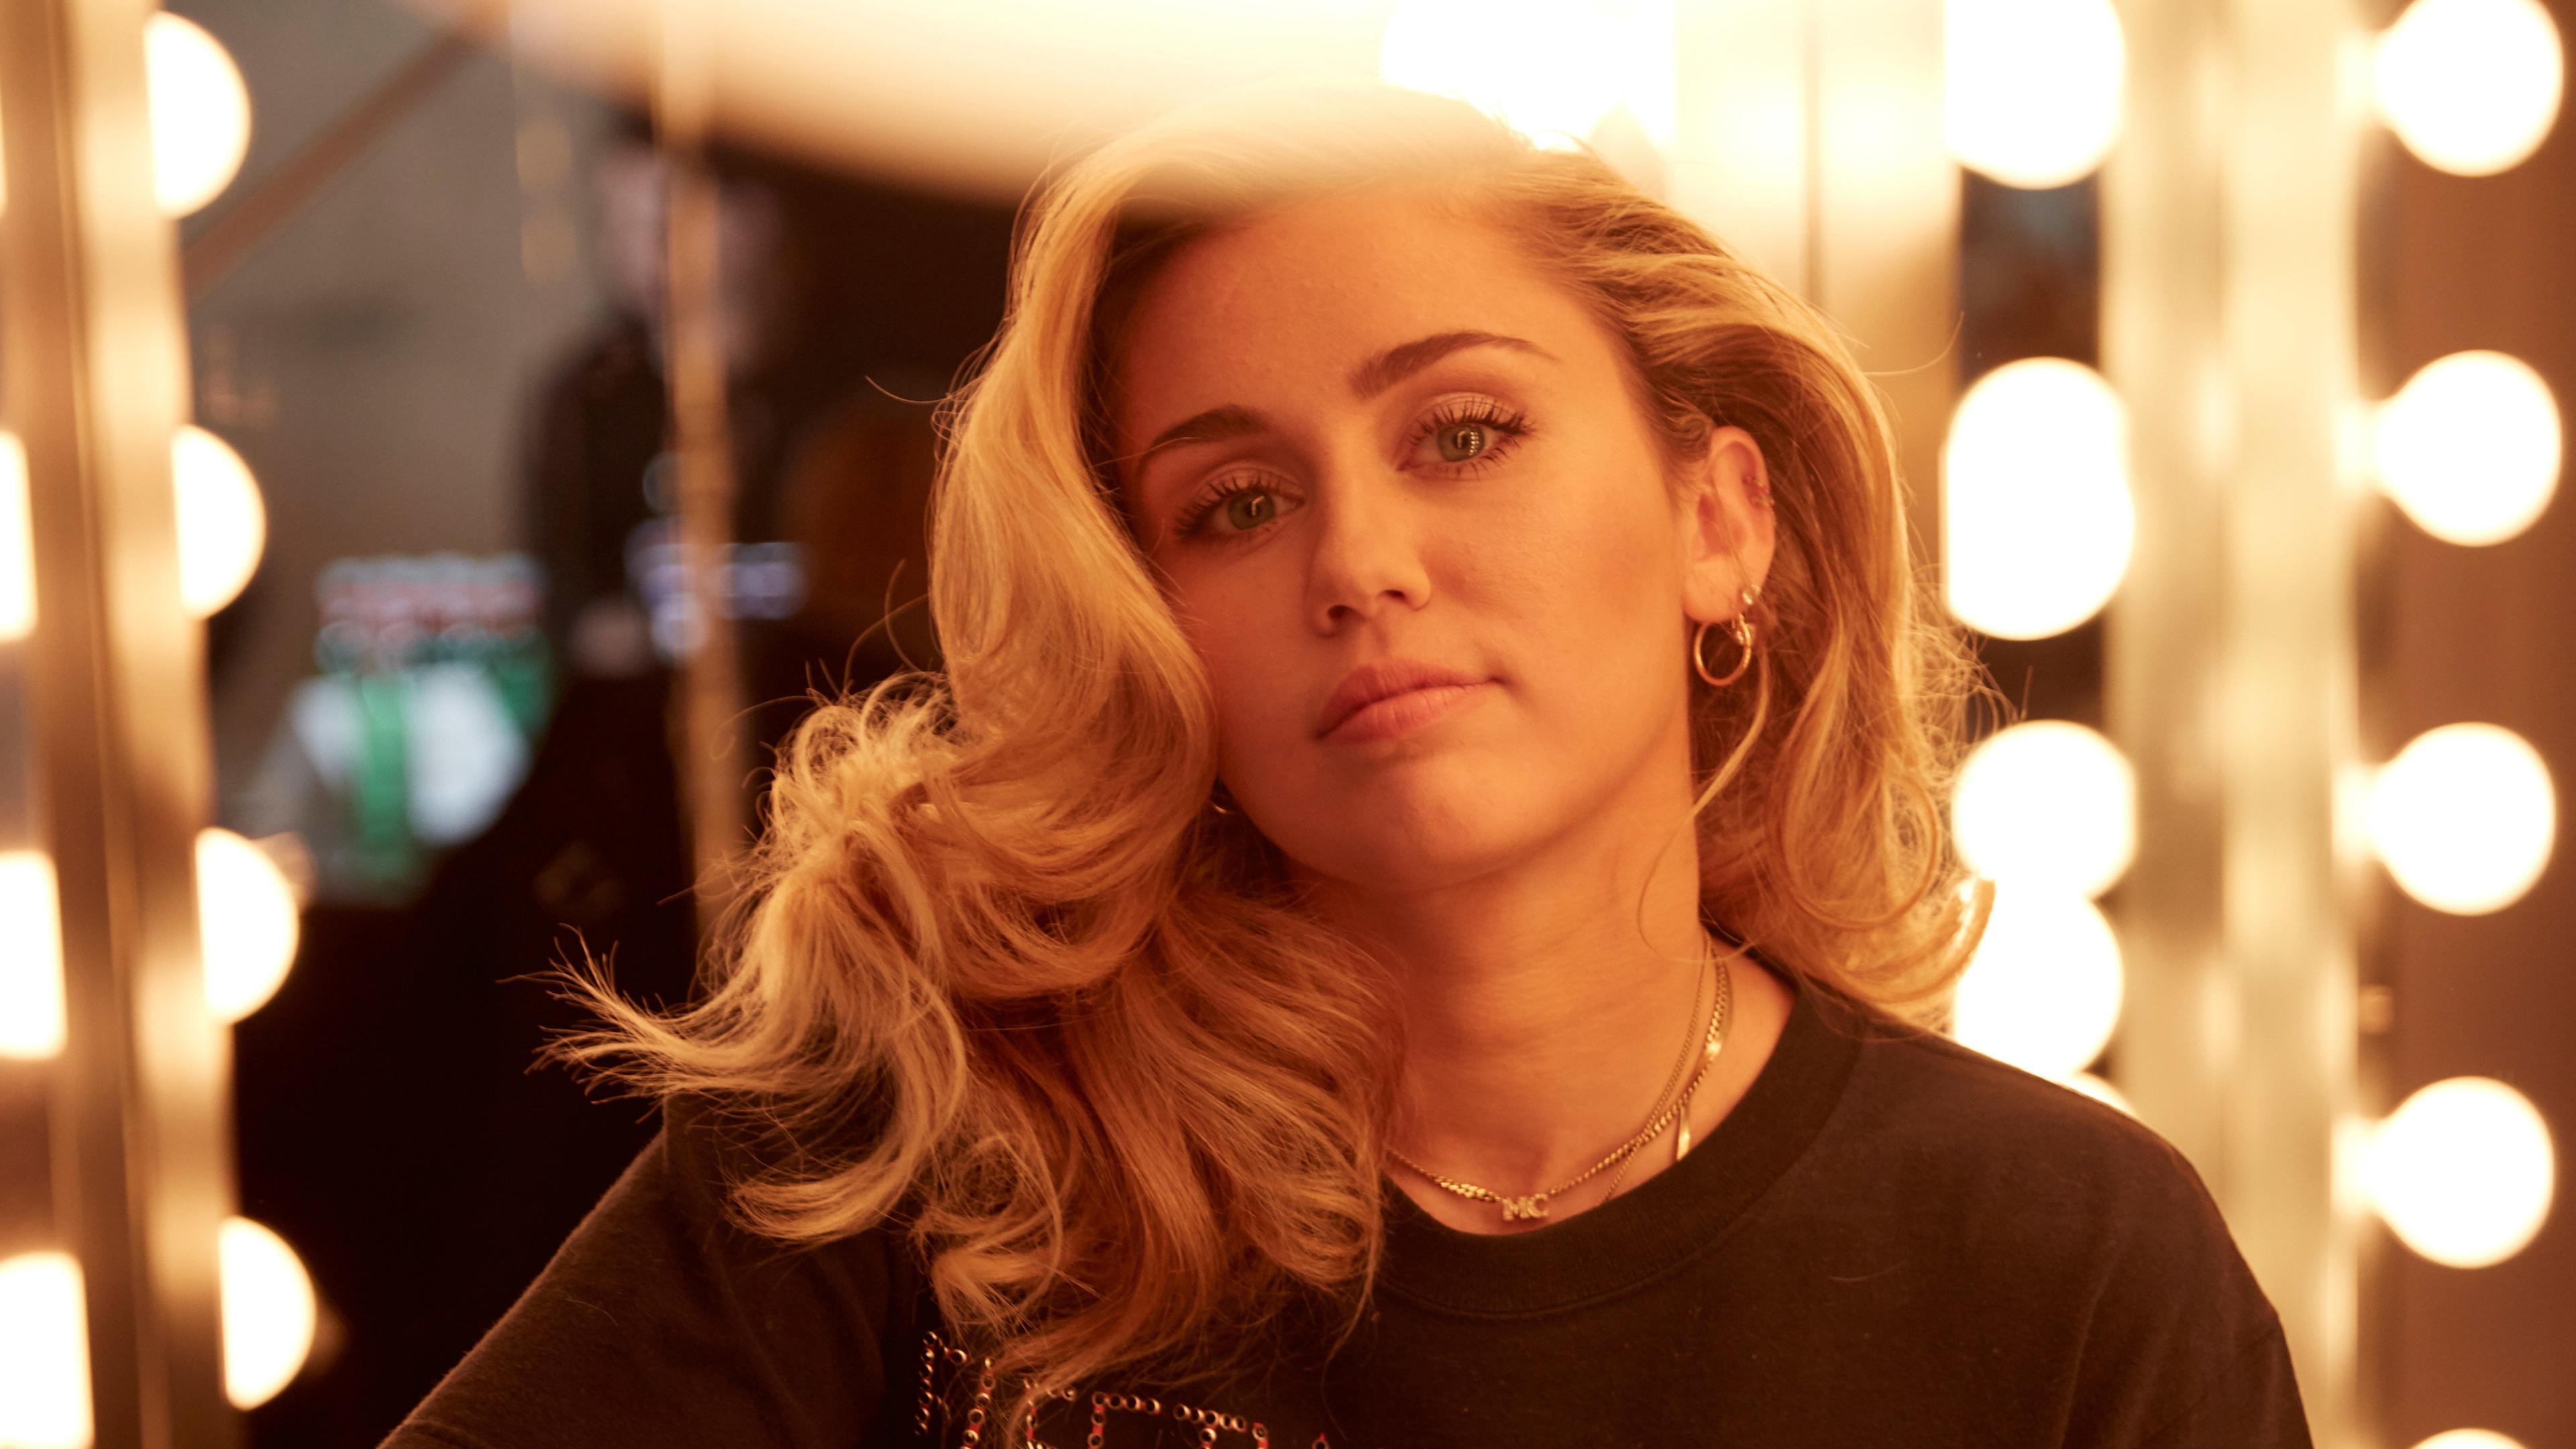 miley cyrus 2019 4k 1553073518 - Miley Cyrus 2019 4k - music wallpapers, miley cyrus wallpapers, hd-wallpapers, girls wallpapers, celebrities wallpapers, 5k wallpapers, 4k-wallpapers